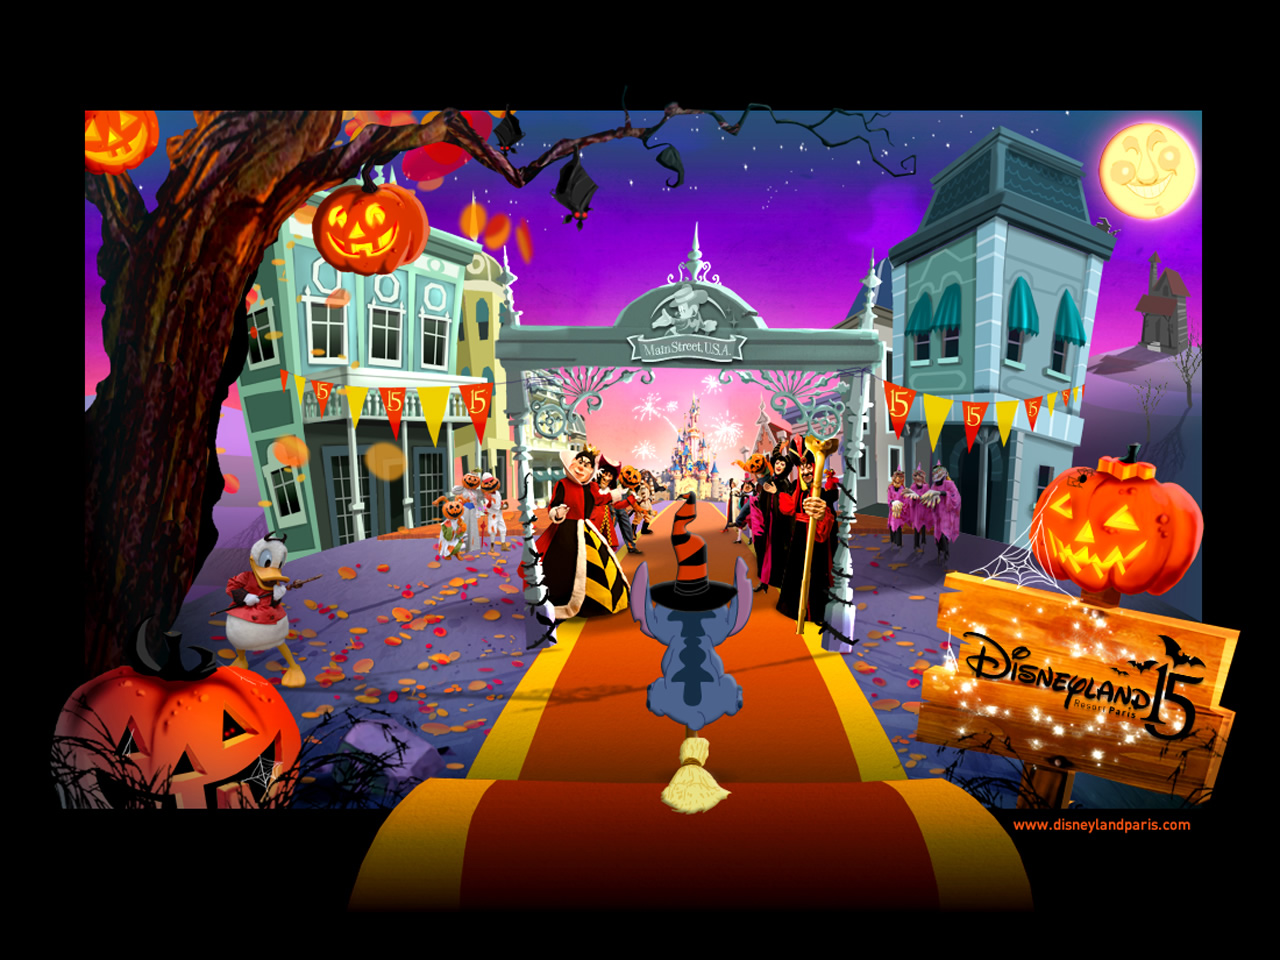 ... Halloween 2012 wallpaper for Disney's fan | Wallpaper for holiday